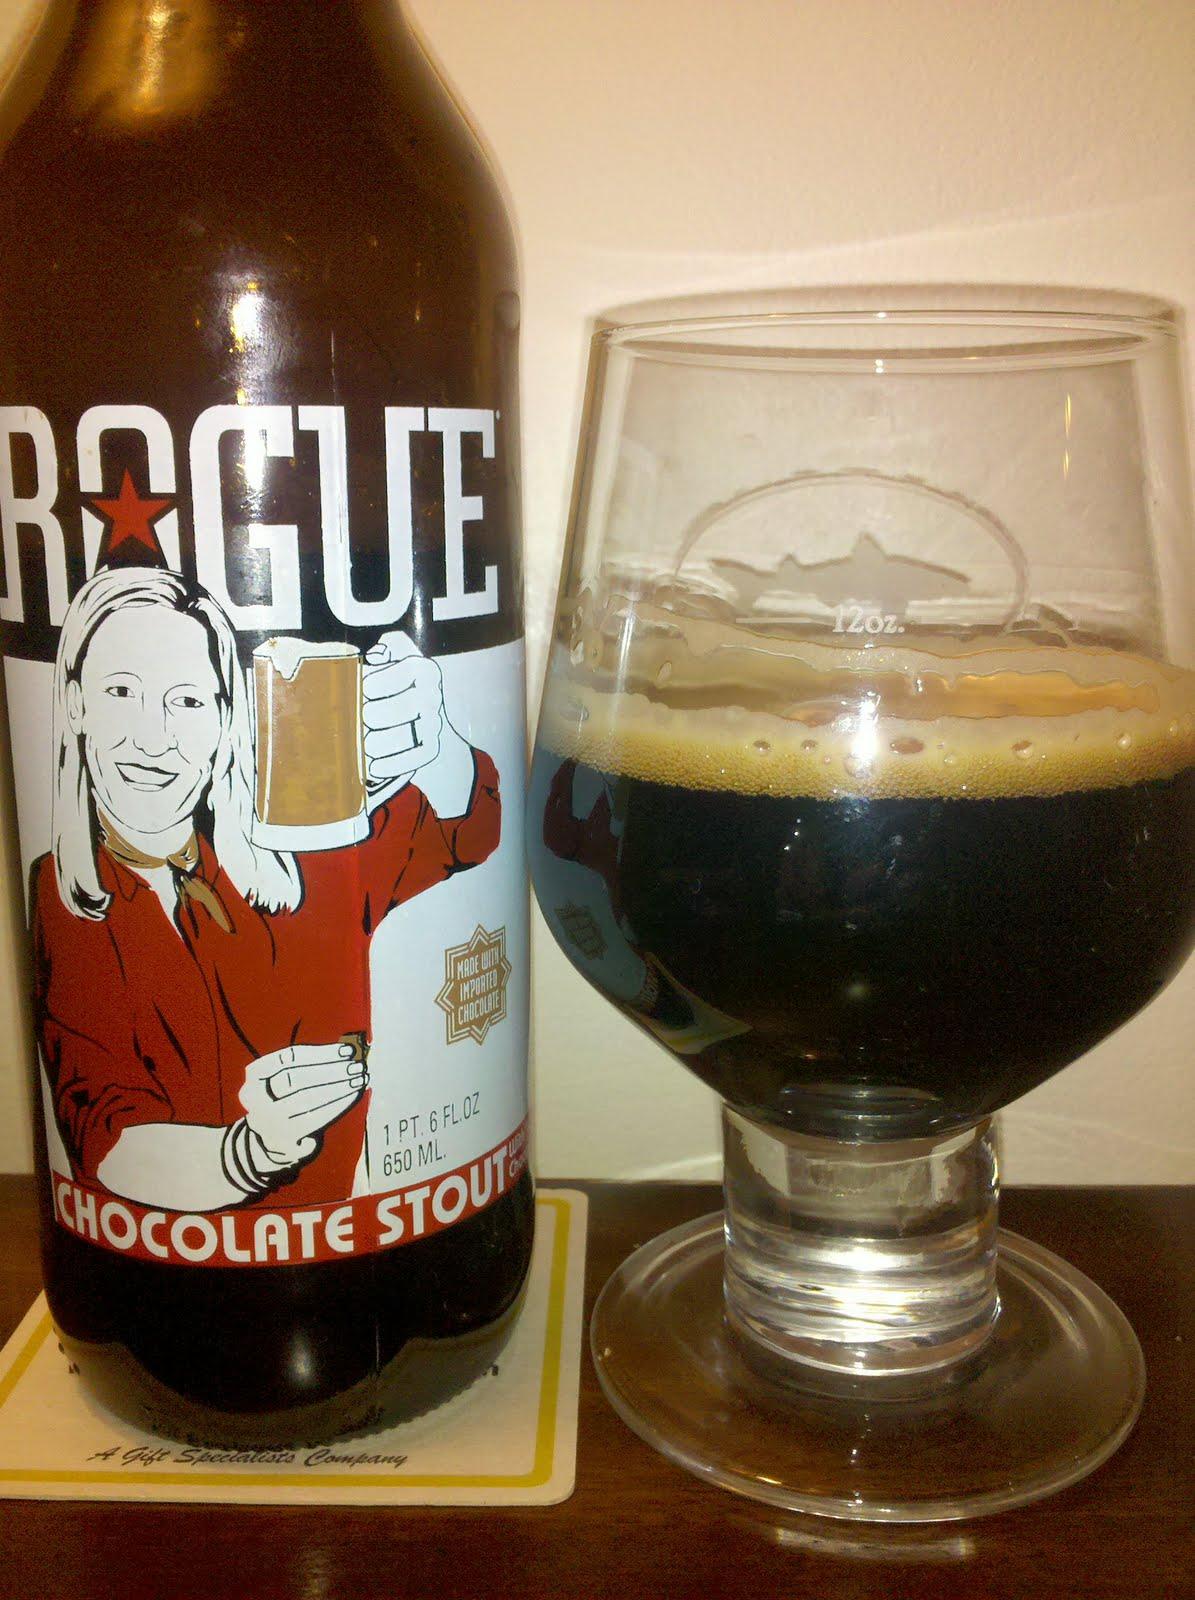 12 Oz Of Heaven: Rogue Chocolate Stout